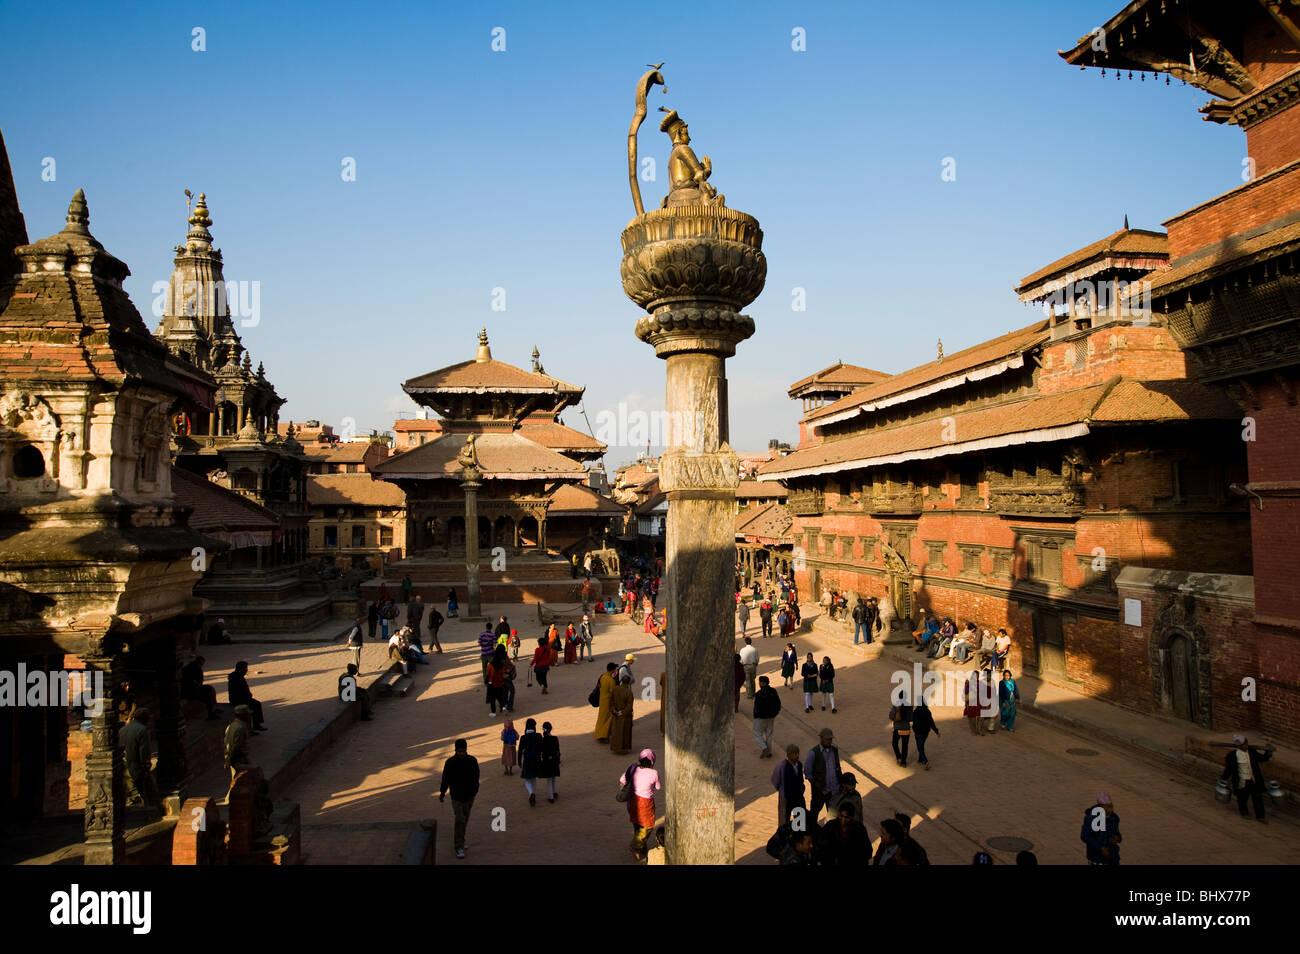 Patan Museum am Durbar Square, Kathmandu, Nepal Stockbild